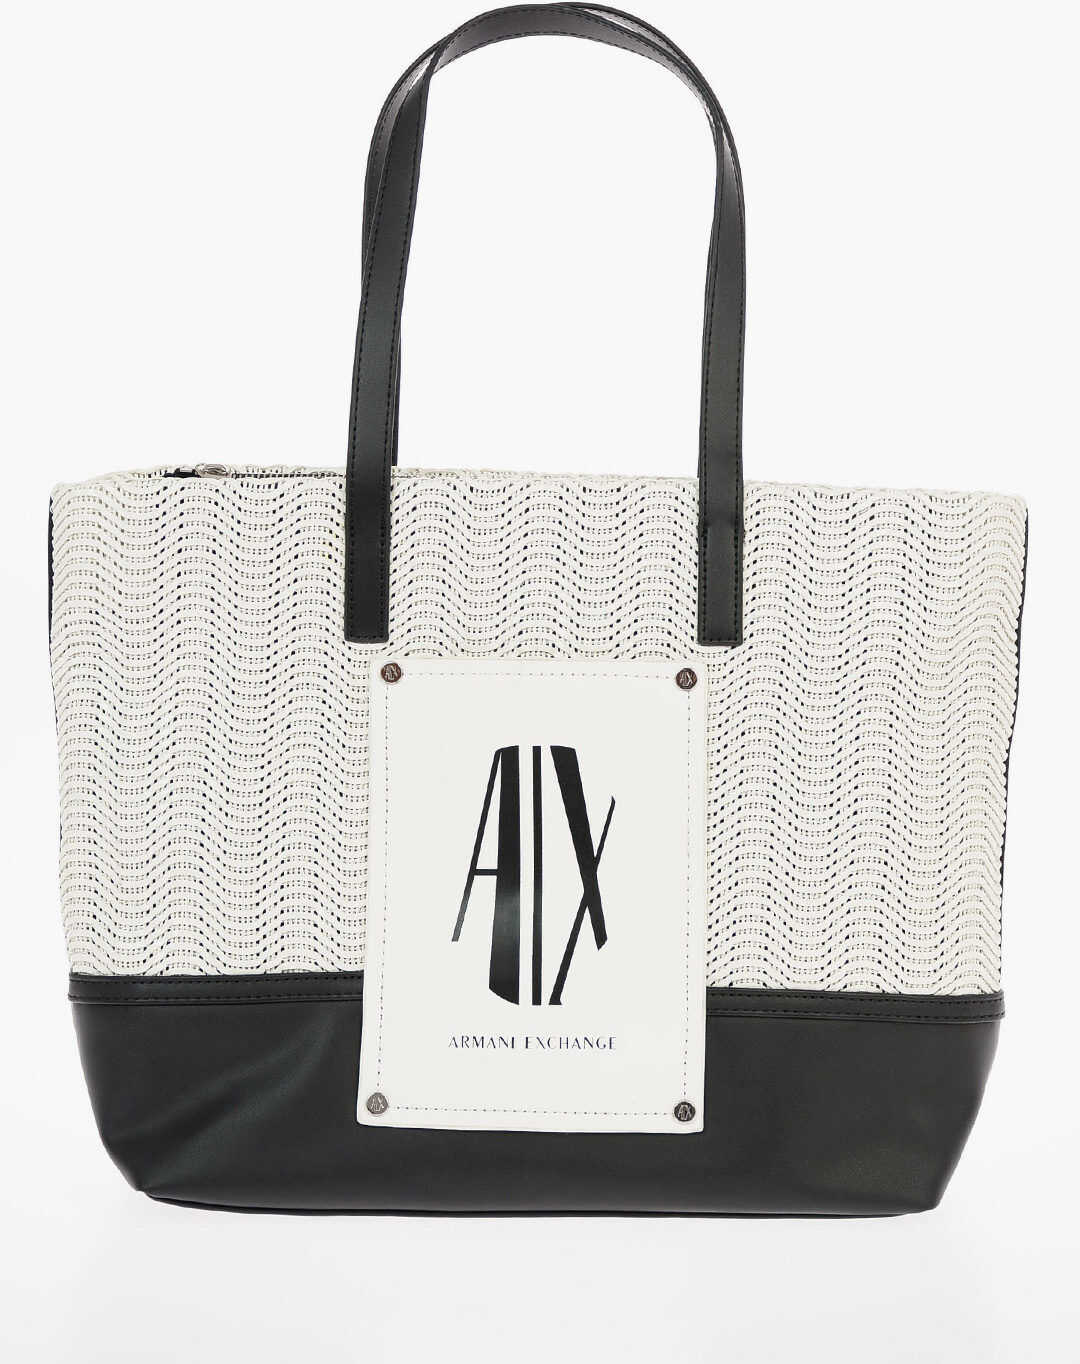 Armani ARMANI EXCHANGE Shopping Bag with Logo BLACK & WHITE imagine b-mall.ro